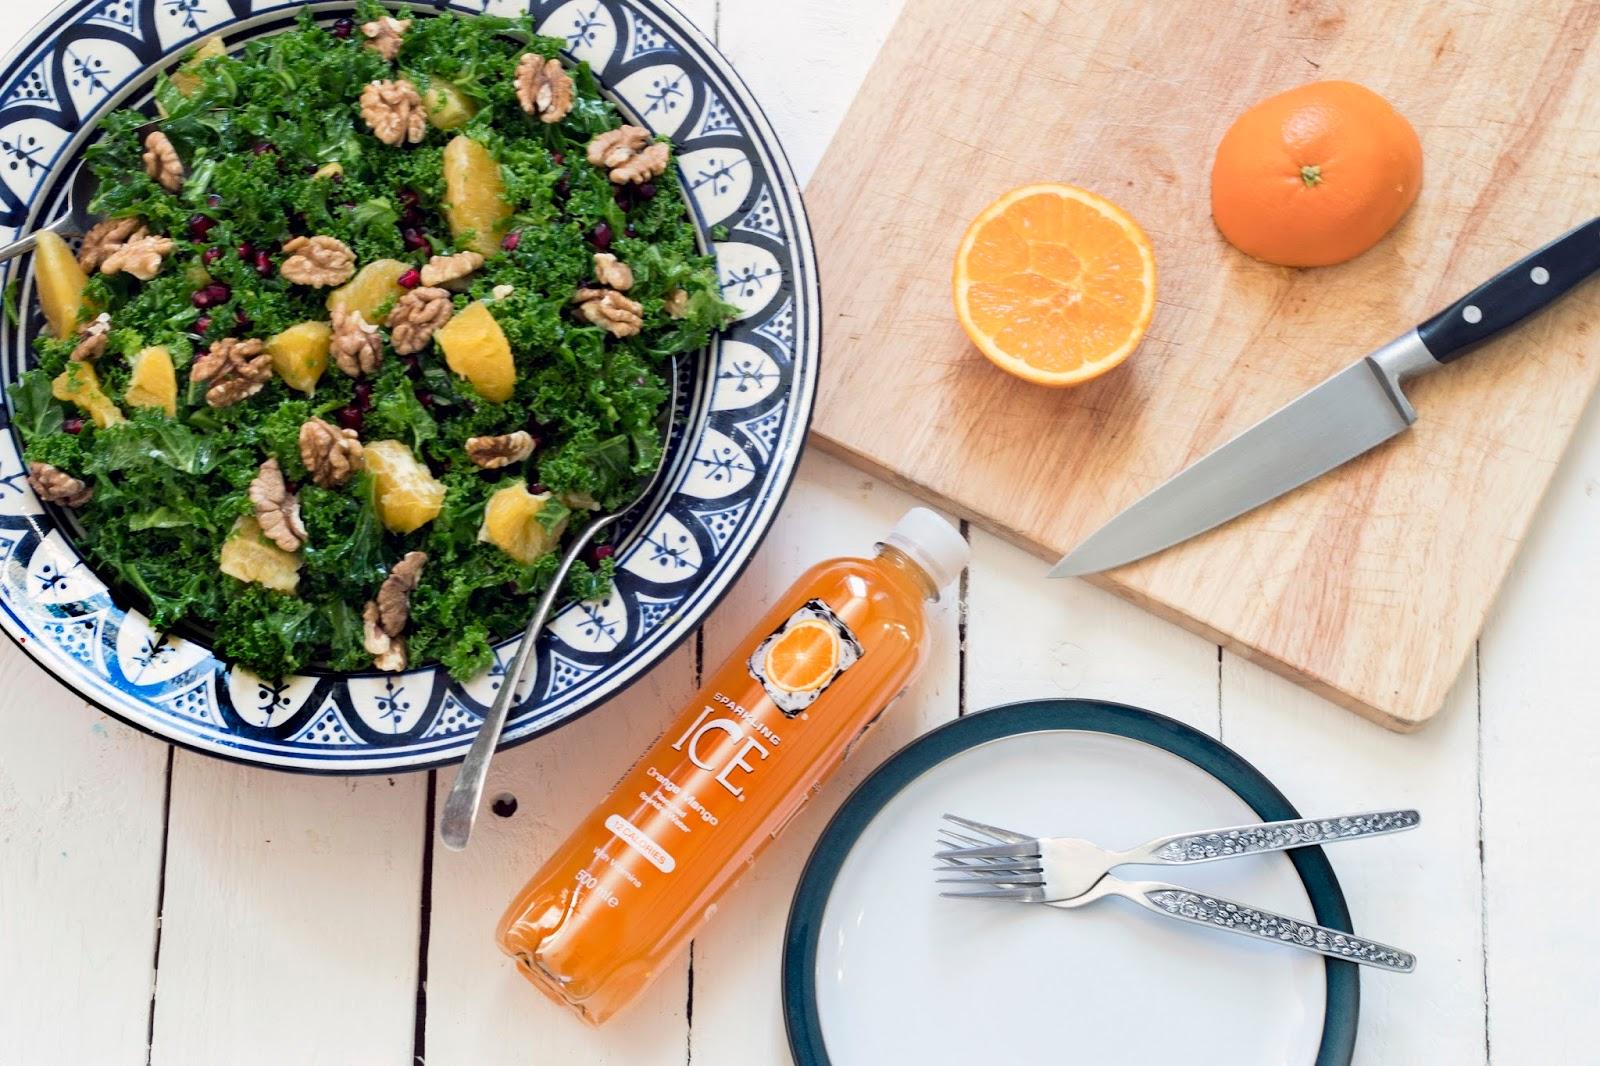 How To Make A Kale, Orange and Pomegranate Salad